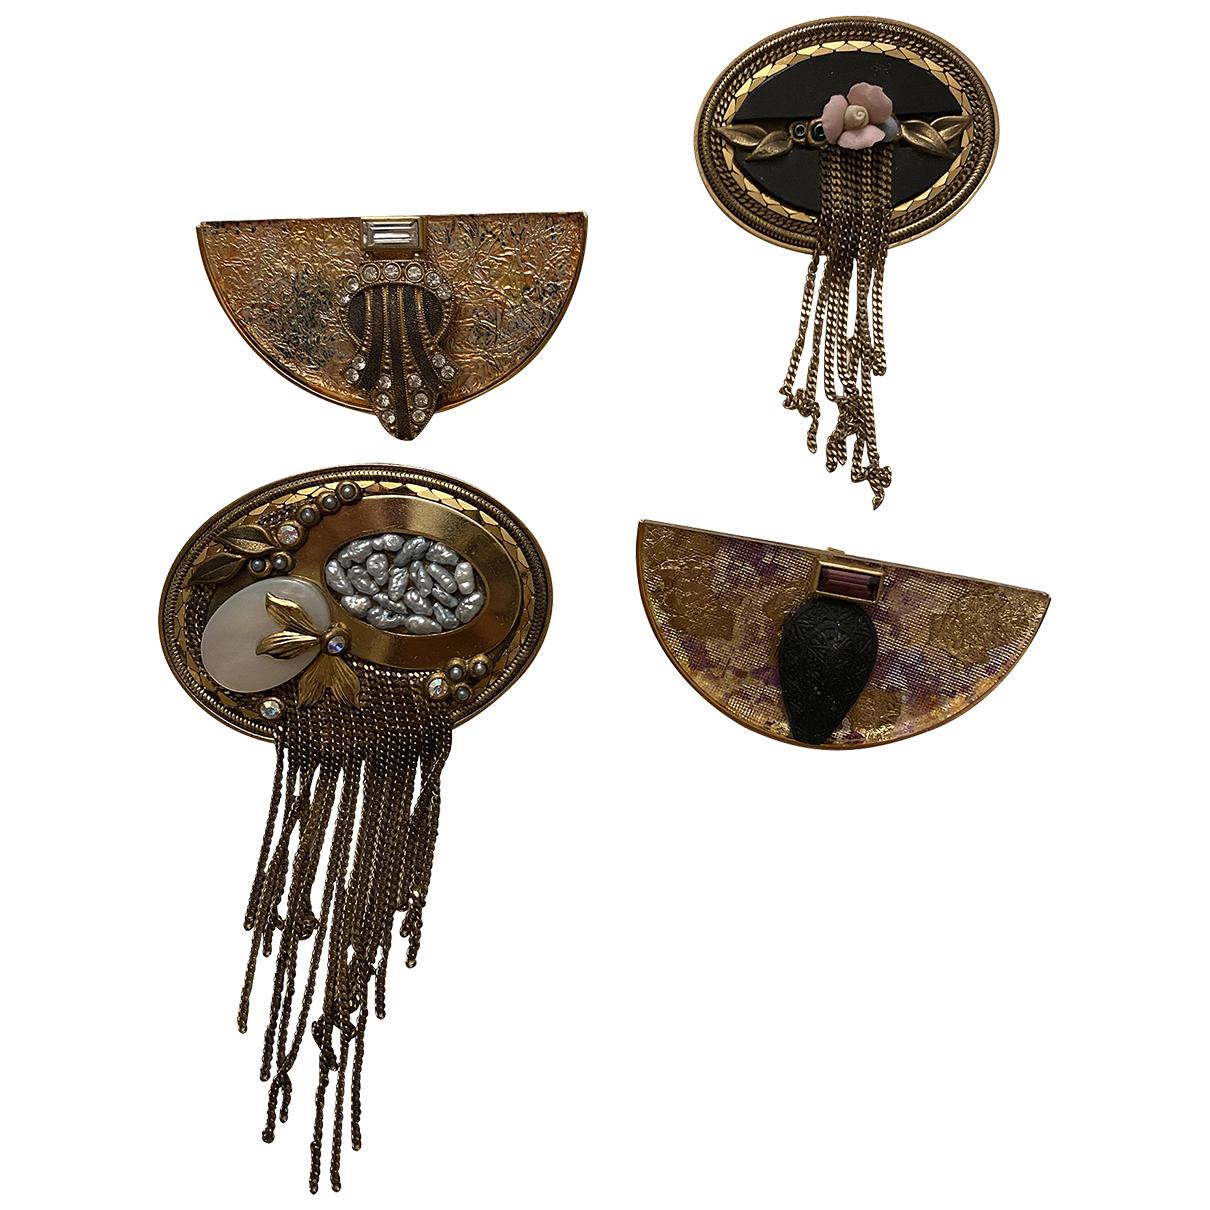 - Broche Art Deco pour femme en metal - dore